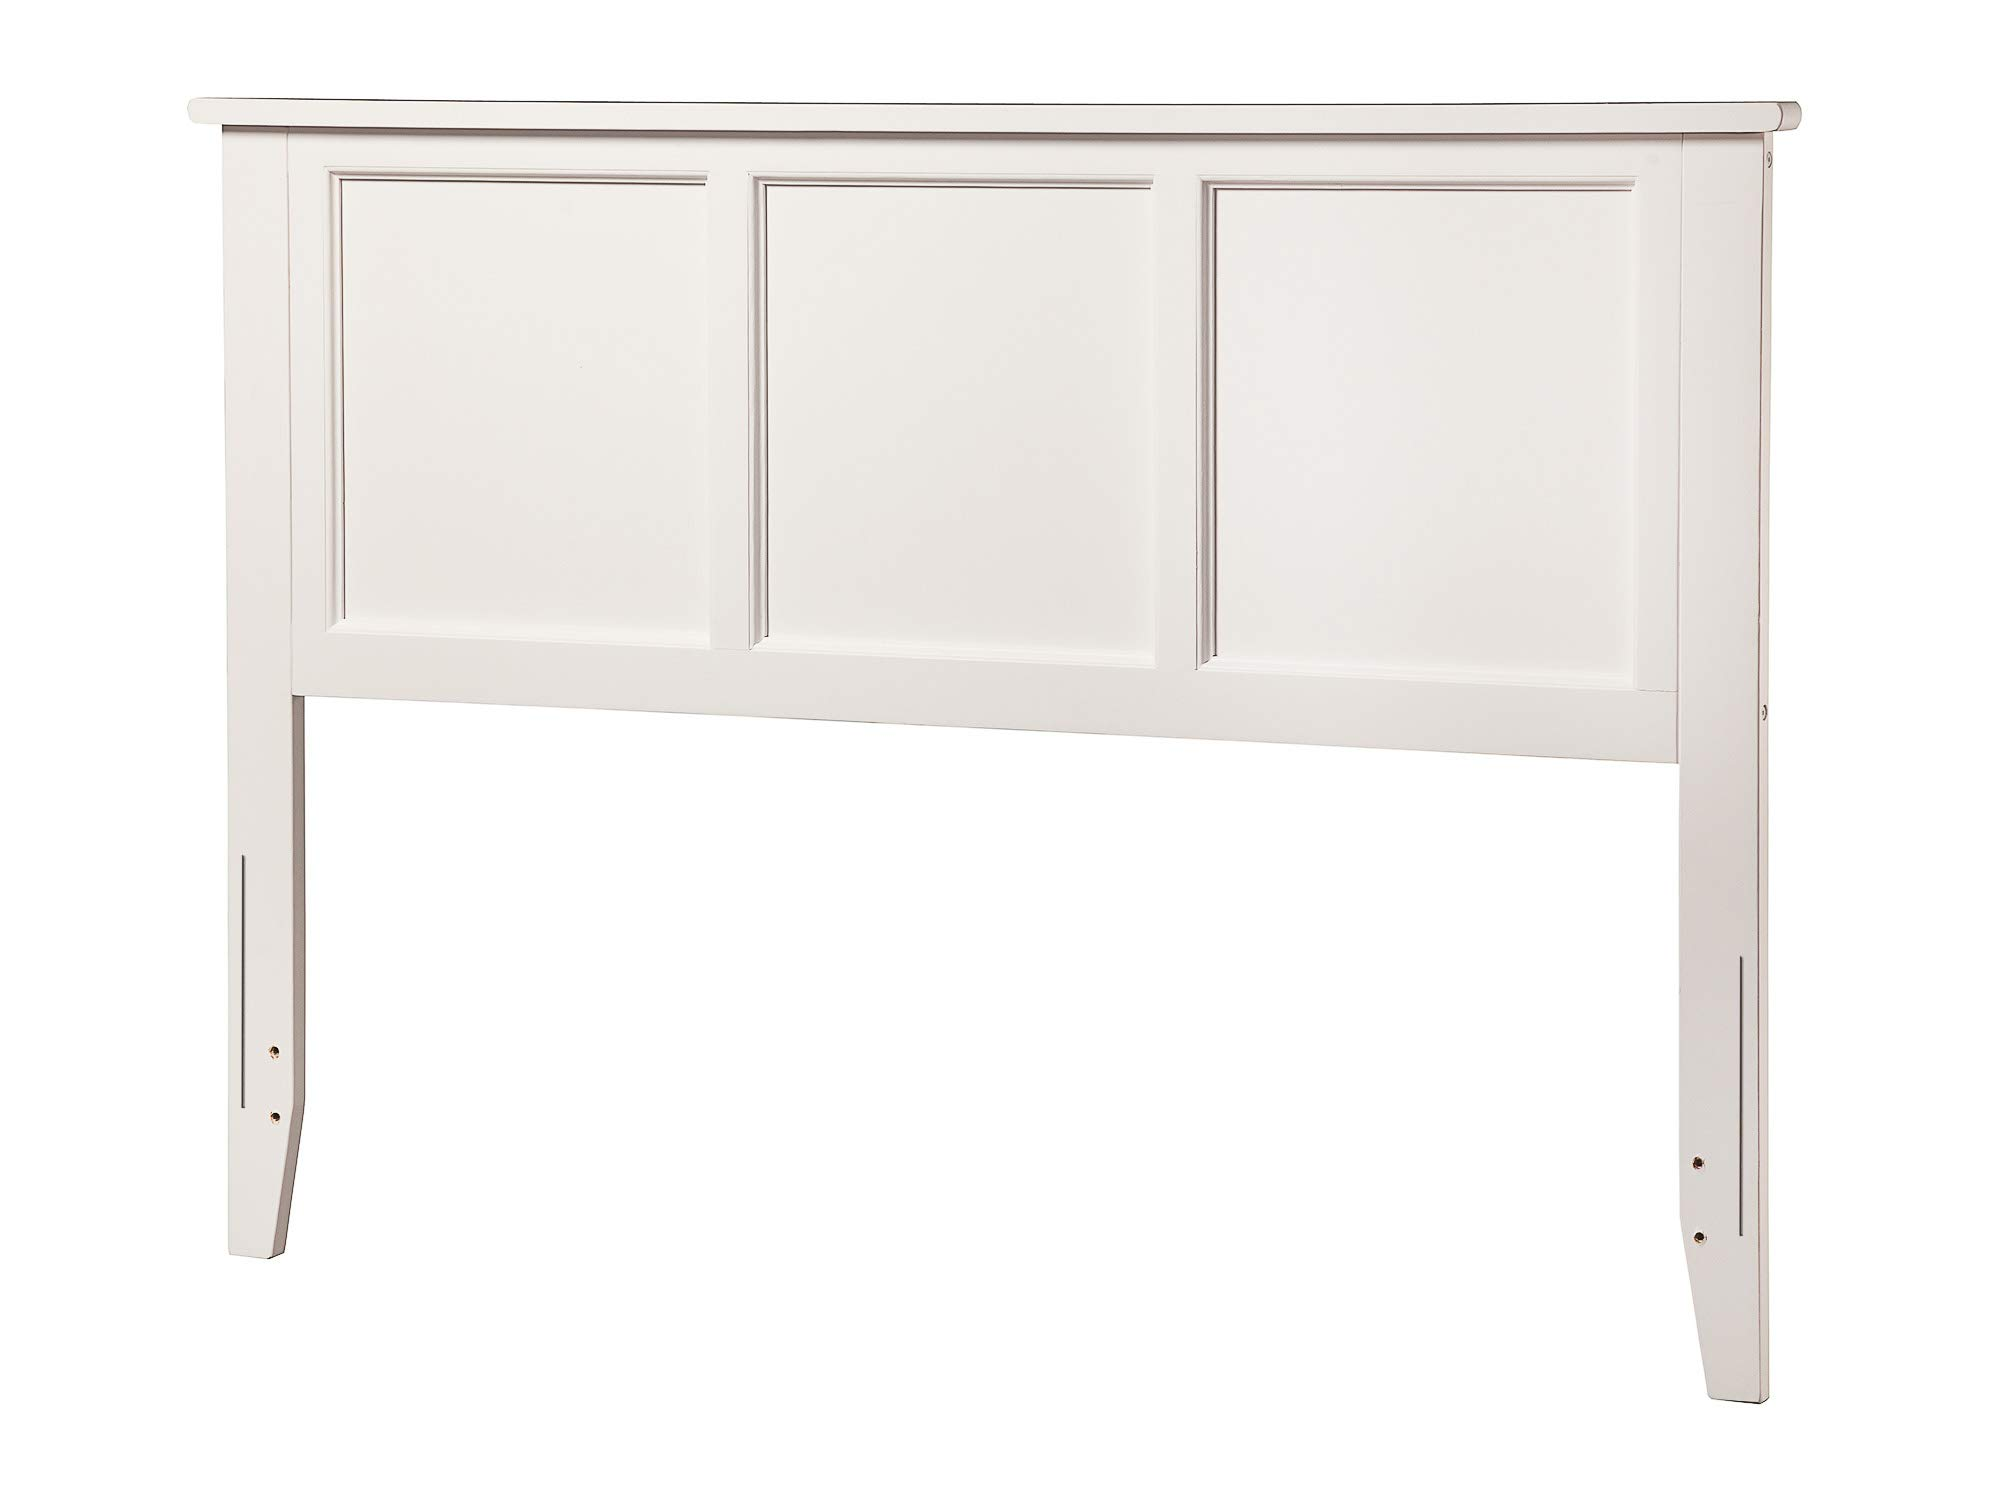 Atlantic Furniture AR286832 Madison Headboard, Full, White